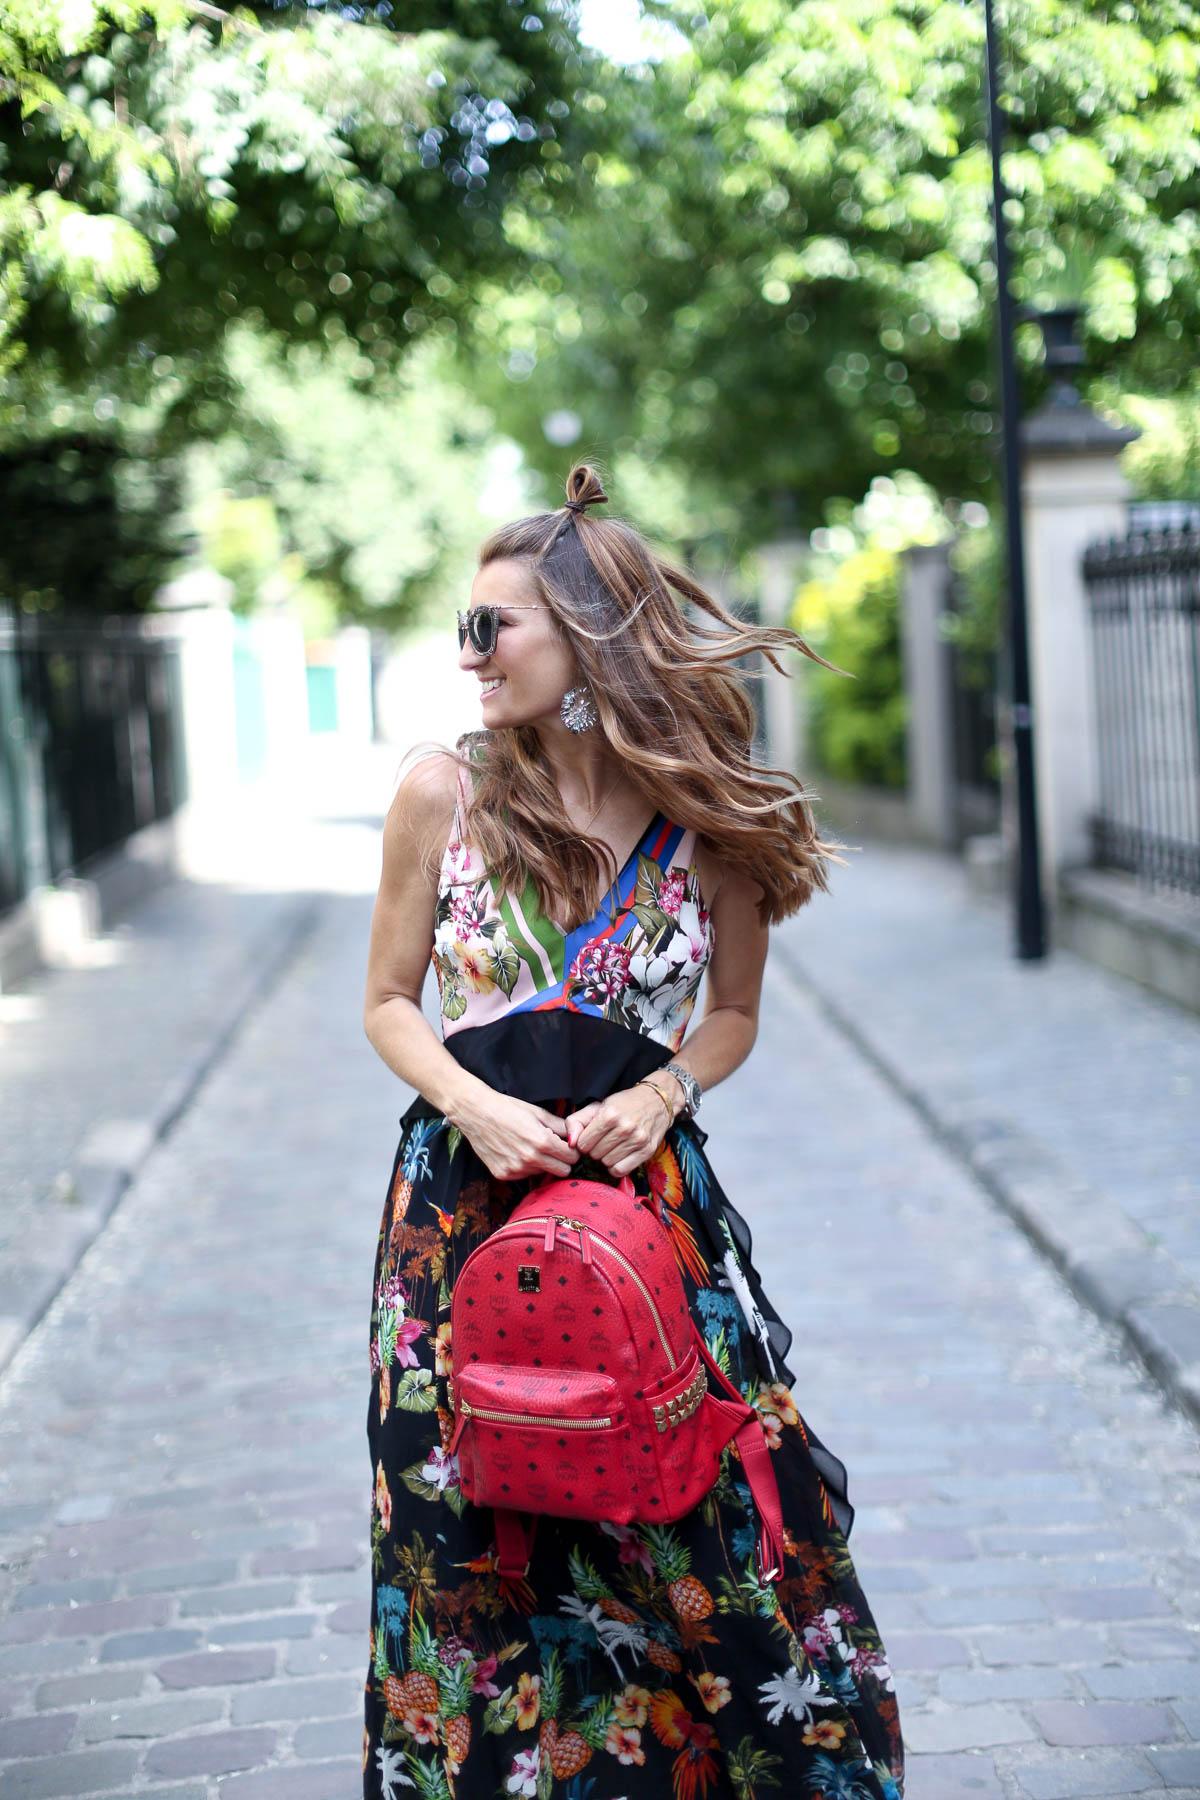 PARIS 17eme IN FLOWERED DRESS-101390-bartabacmode